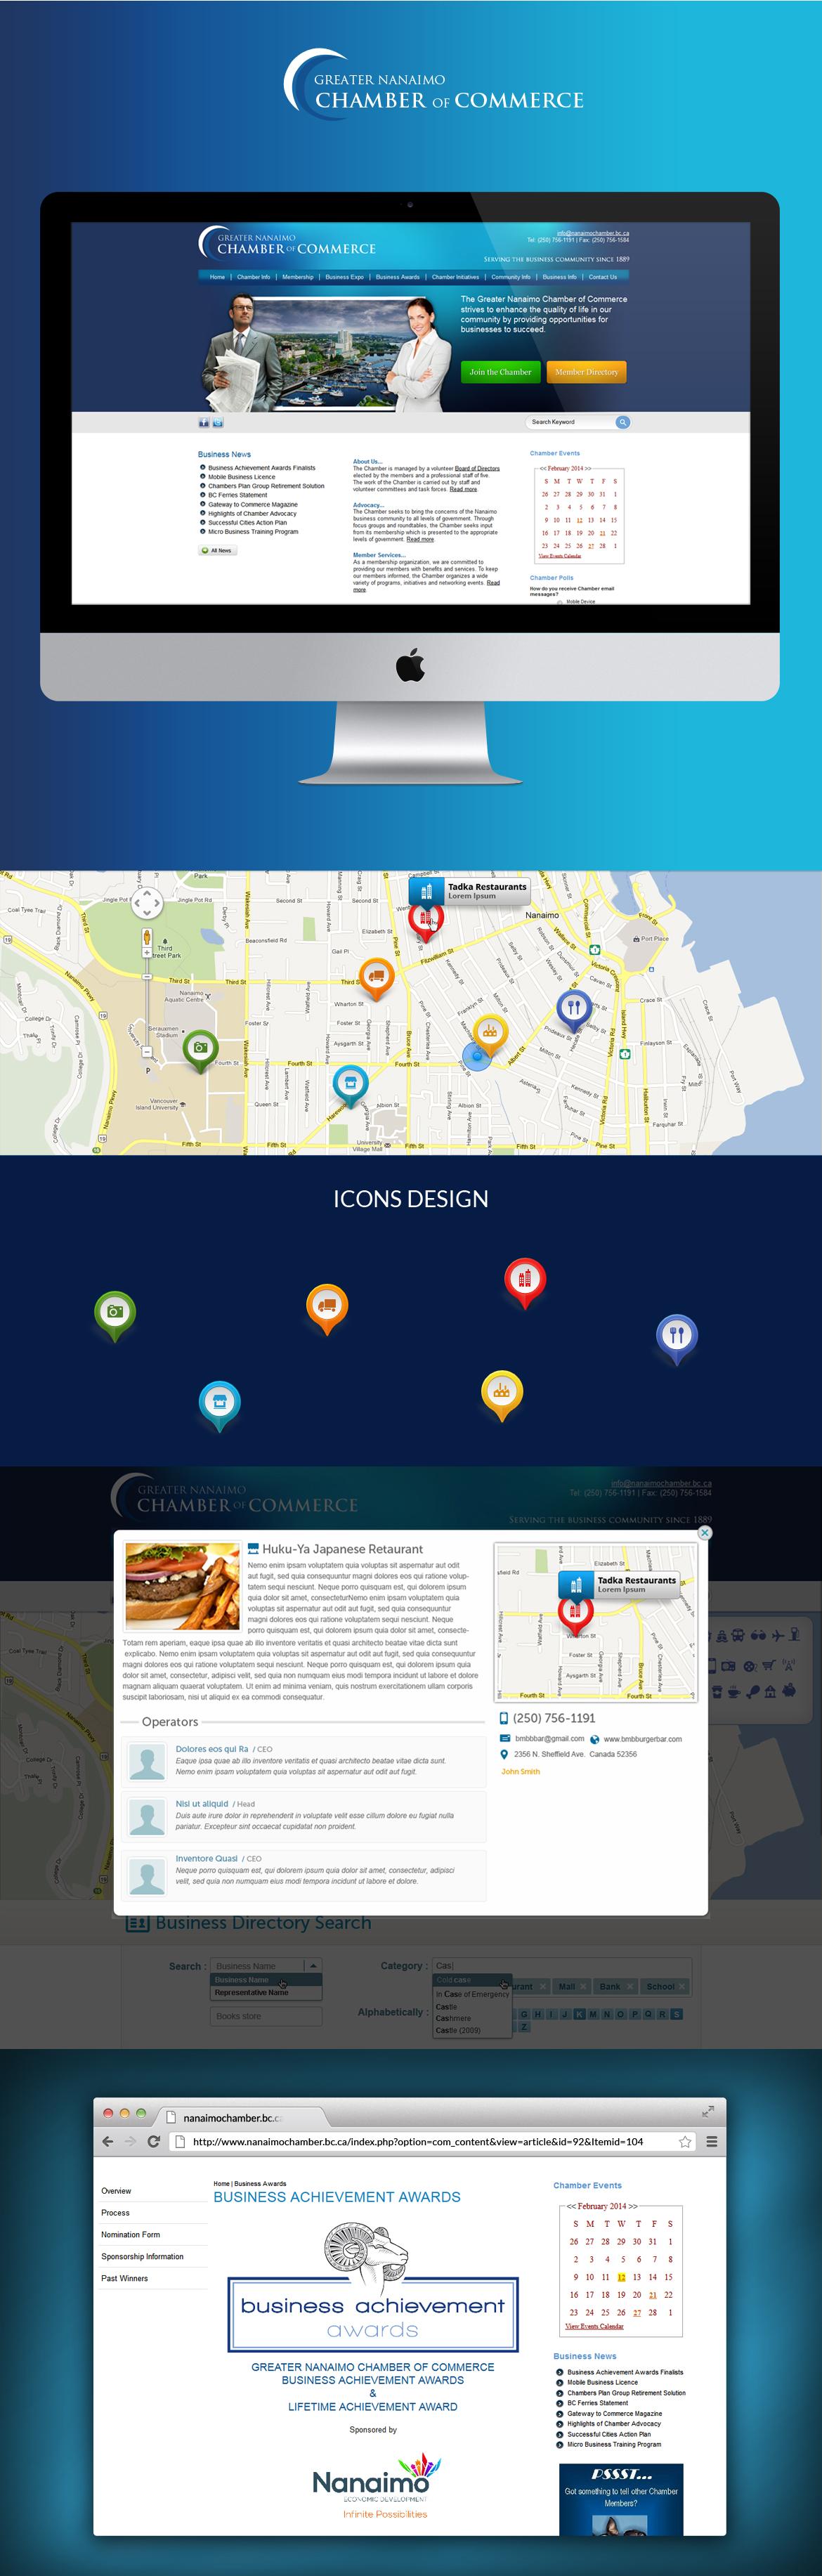 Greater Nanaimo Chamber Of Commmerce Web Development Design Joomla Web Design